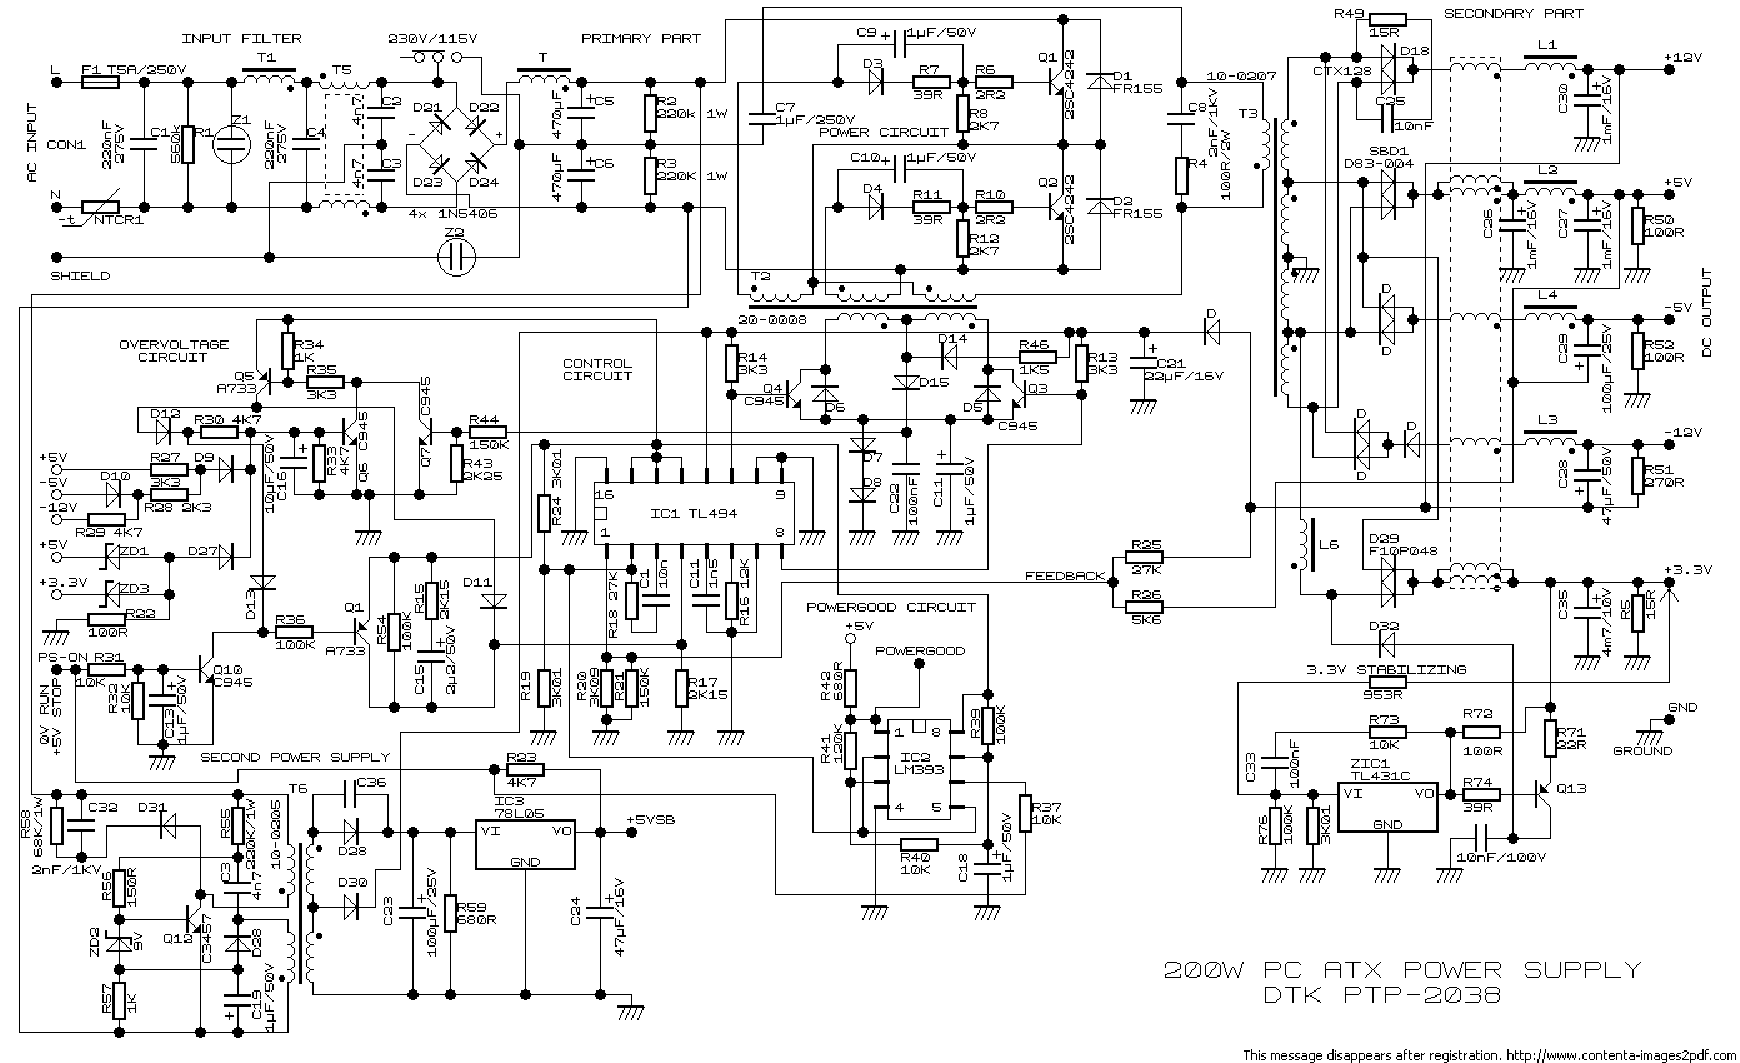 Ps 4241 9hb schematic